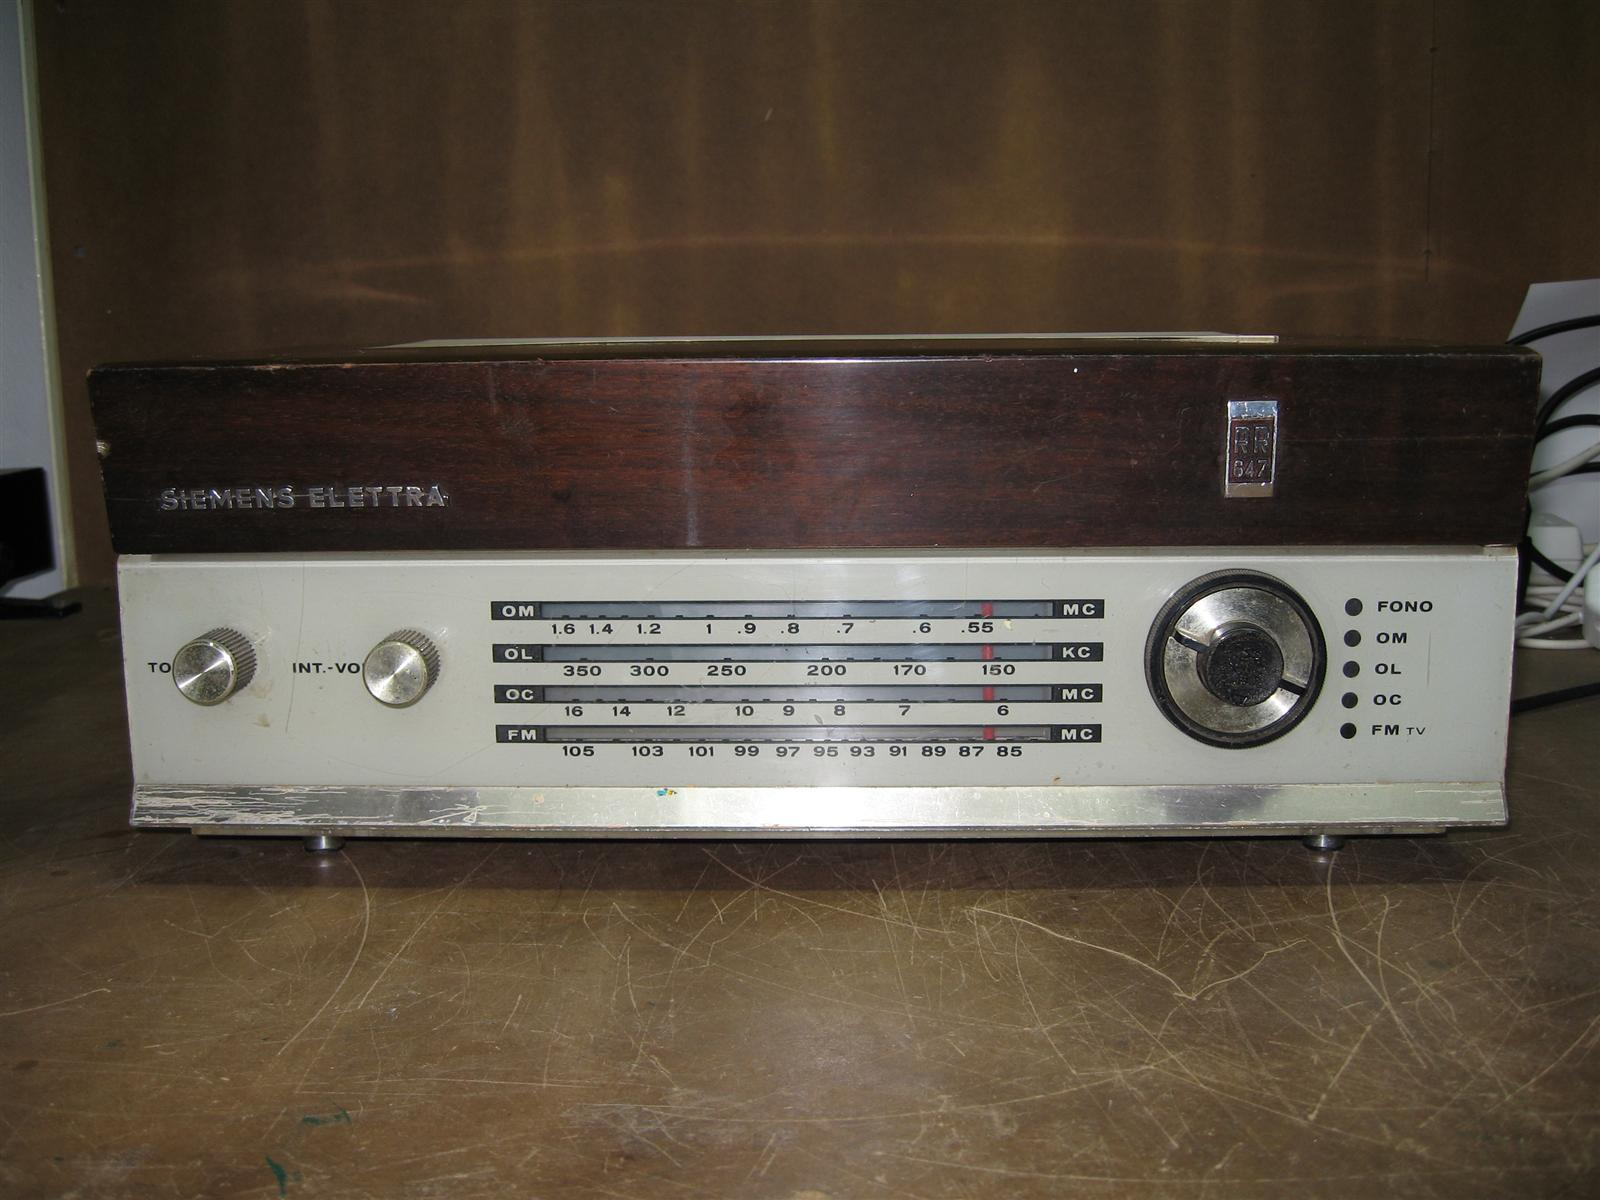 Siemens Elettra RR647